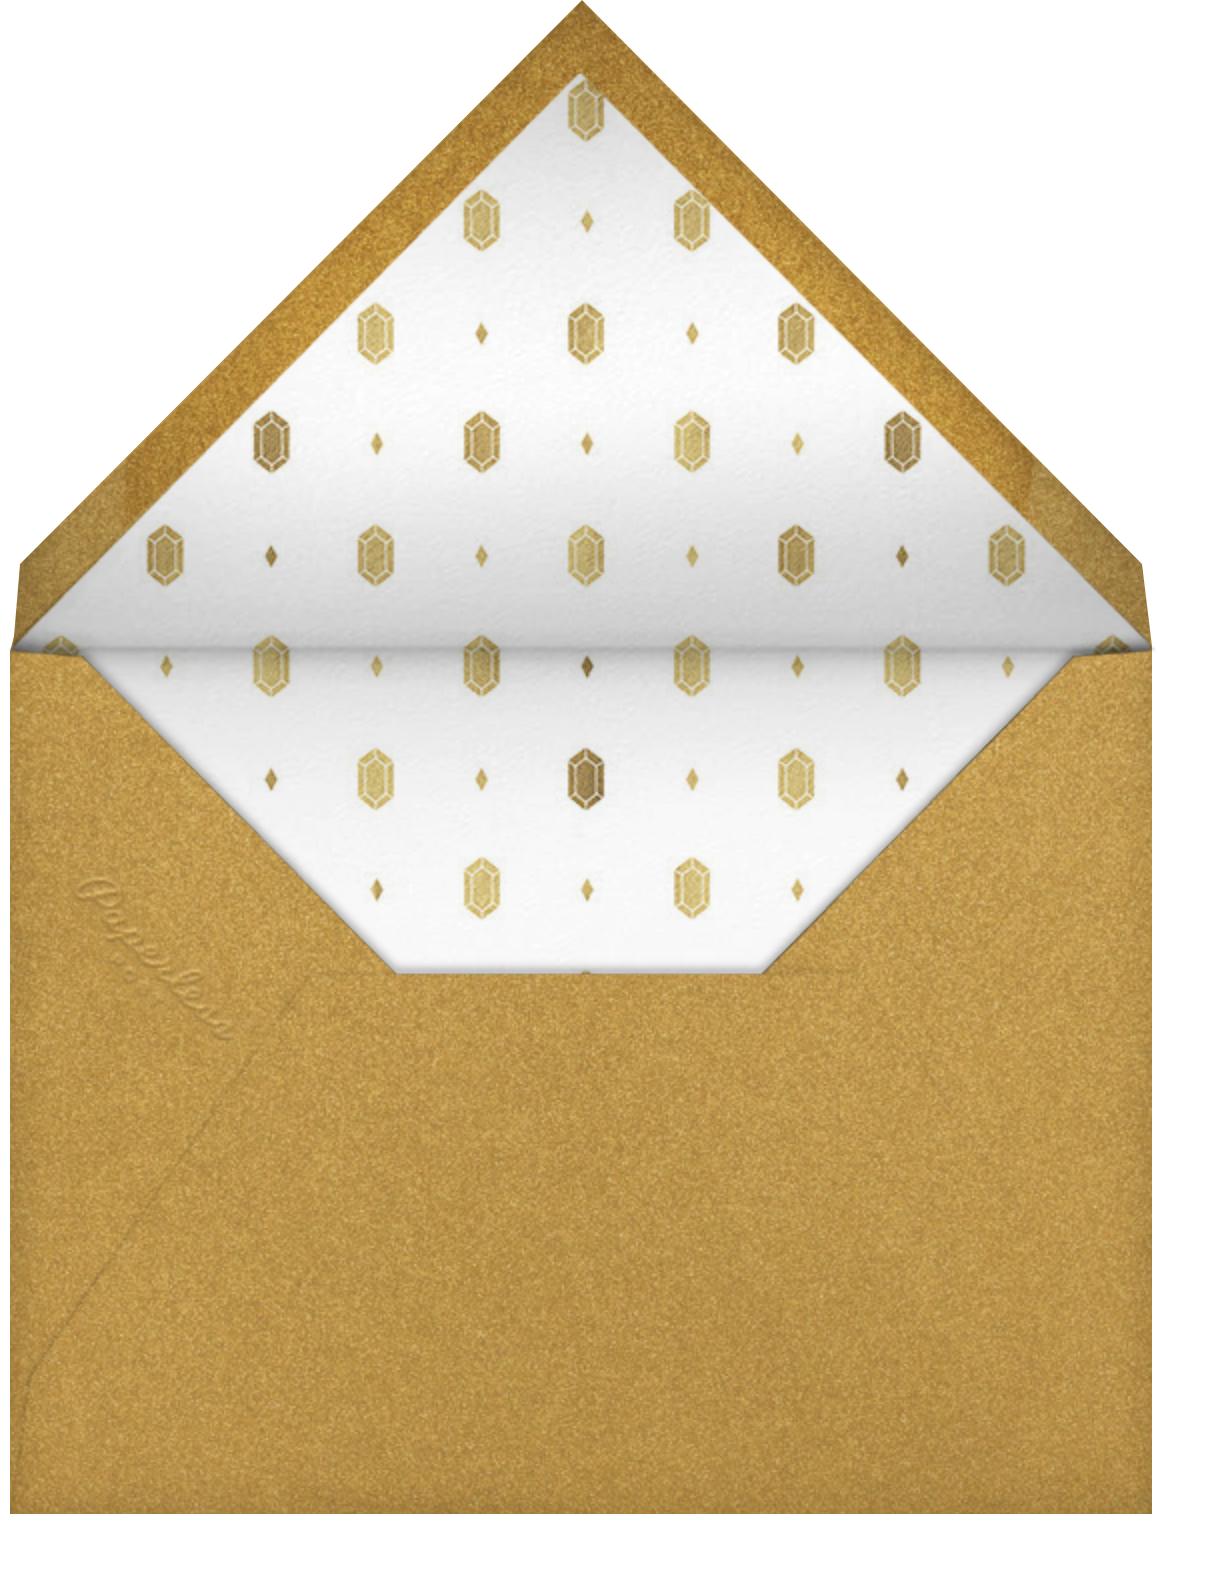 Snapshot Gold - Square - Paperless Post - Envelope